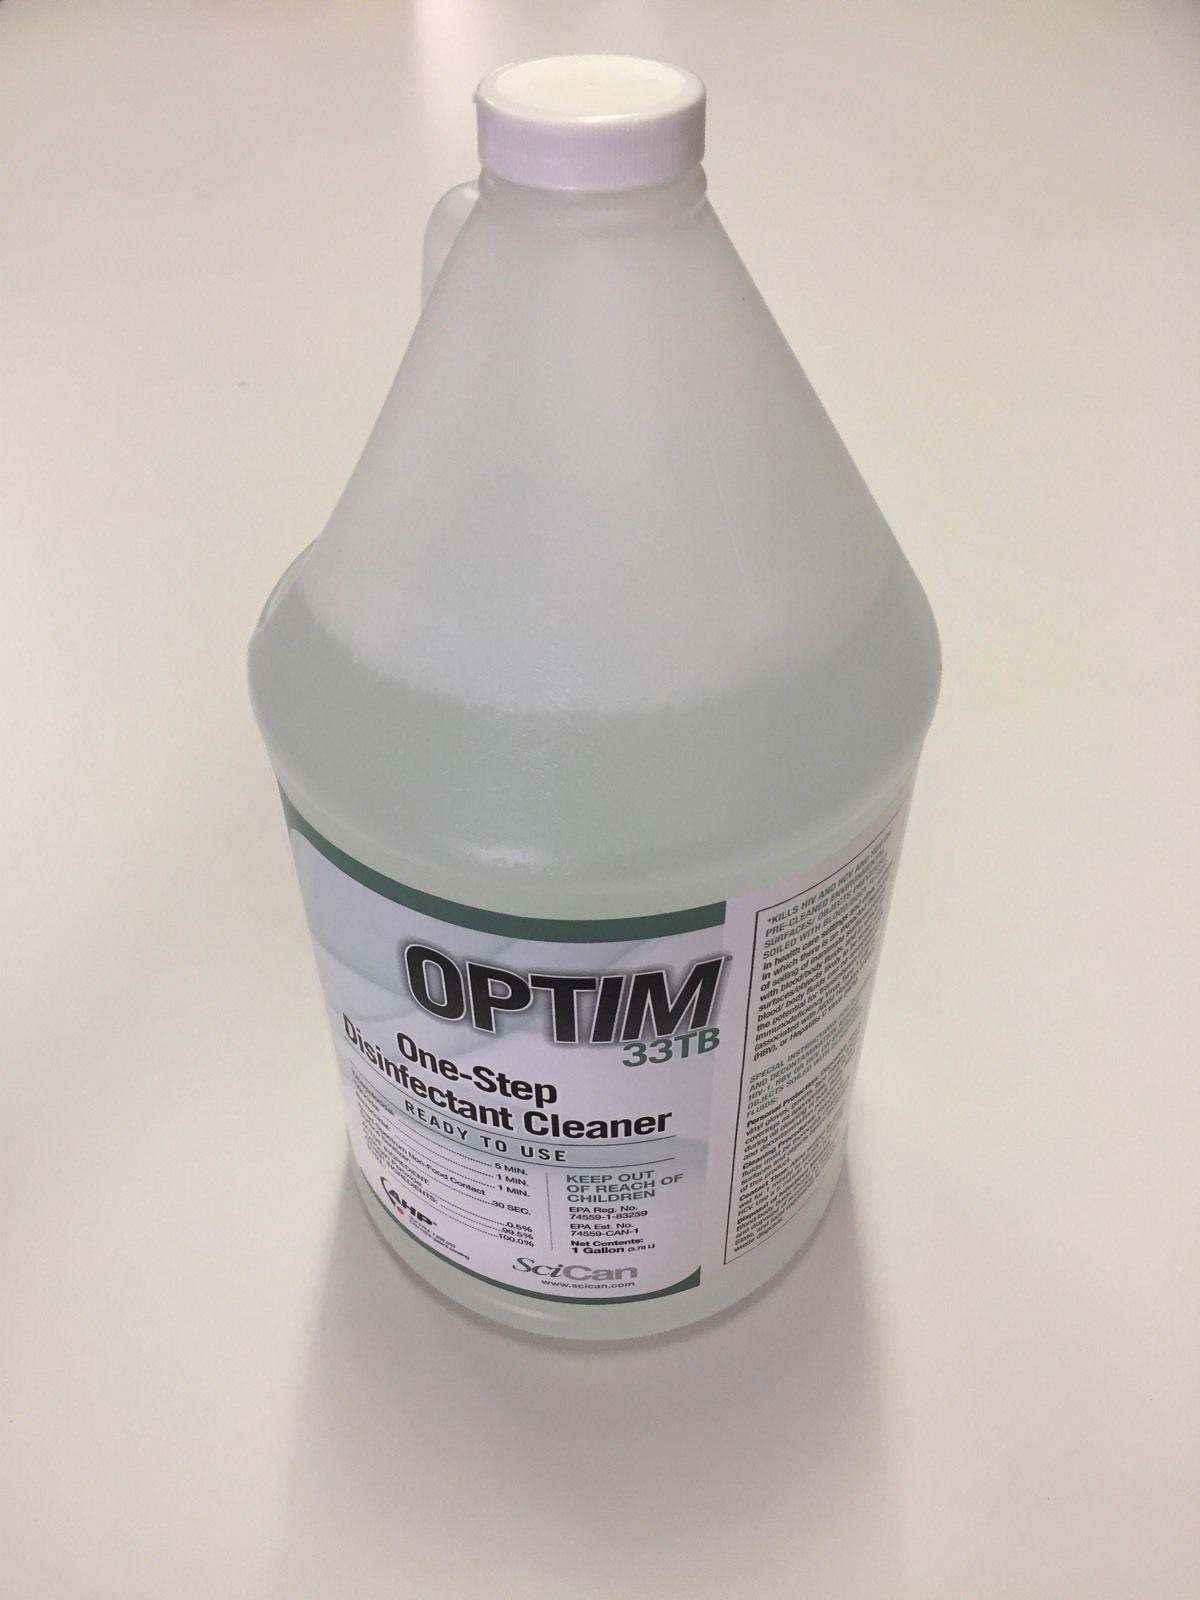 Large Bottle Optim 33TB